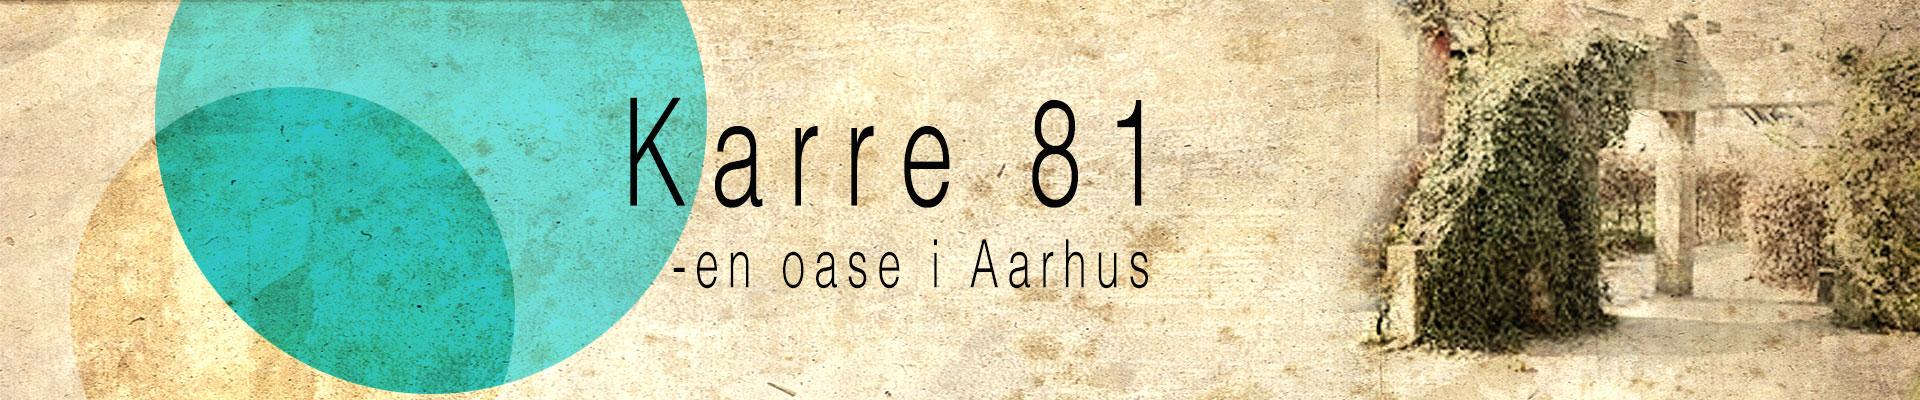 karre81